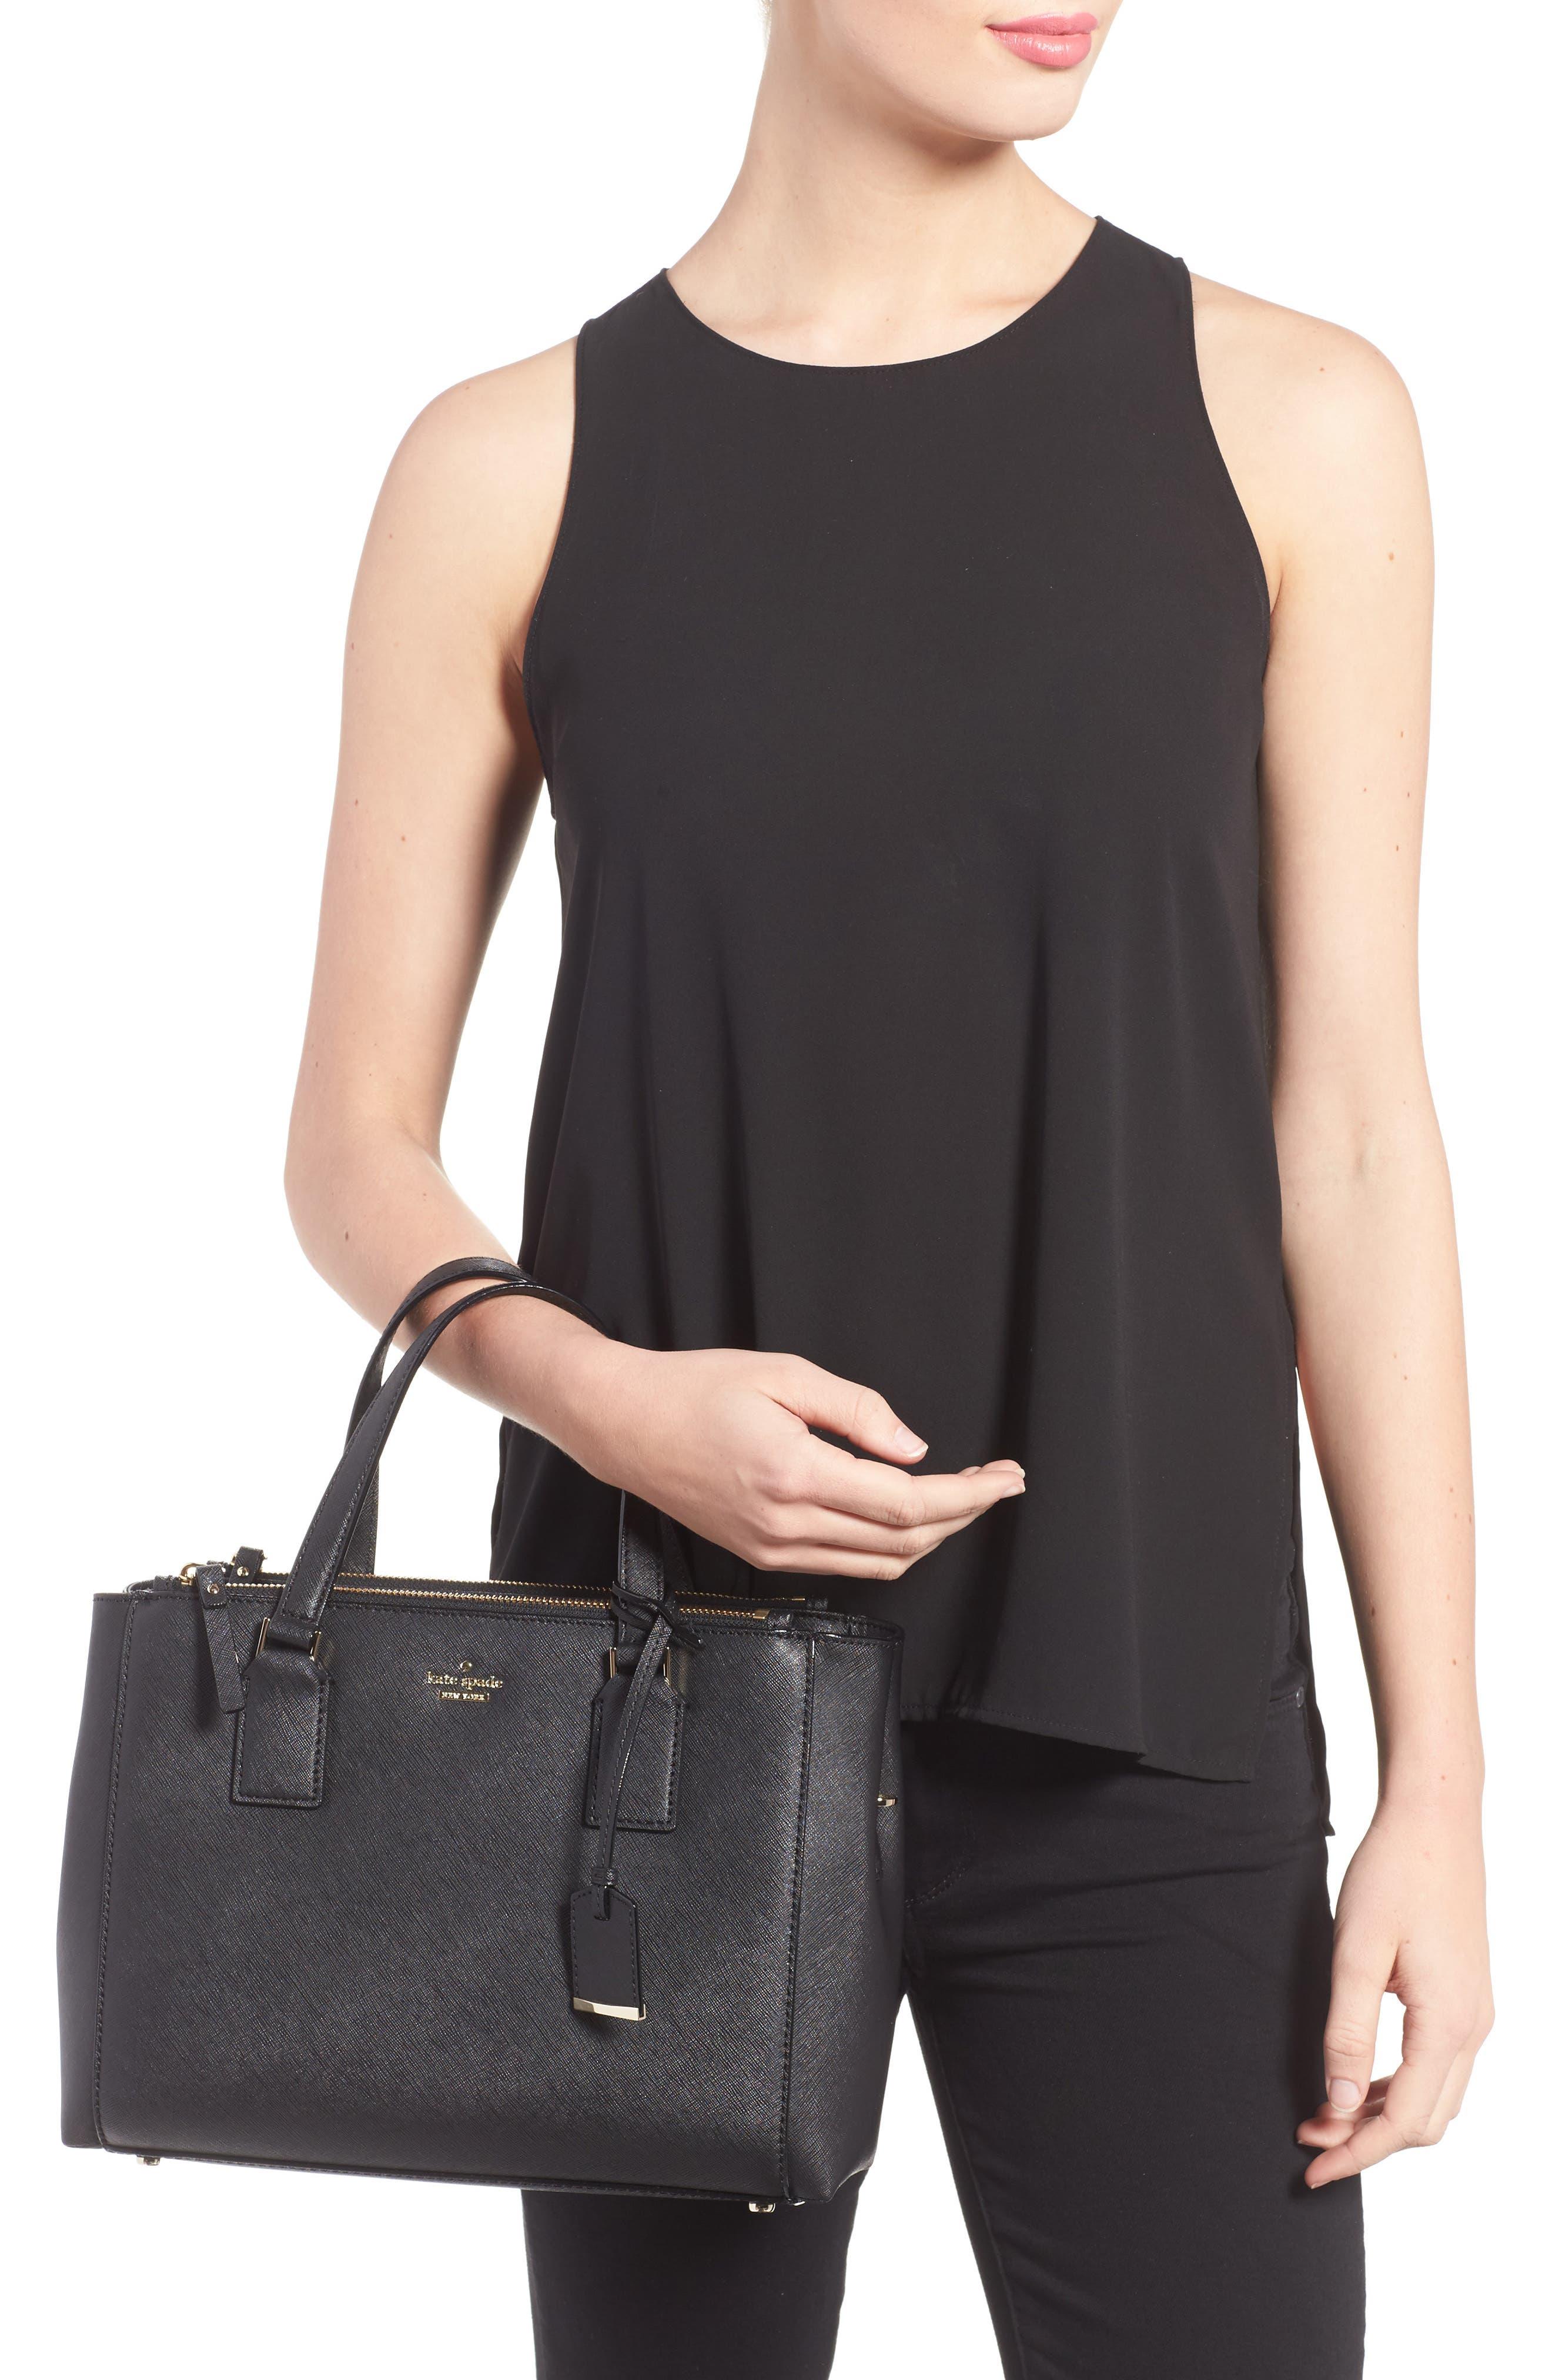 cameron street - teegan calfskin leather satchel,                             Alternate thumbnail 2, color,                             Black